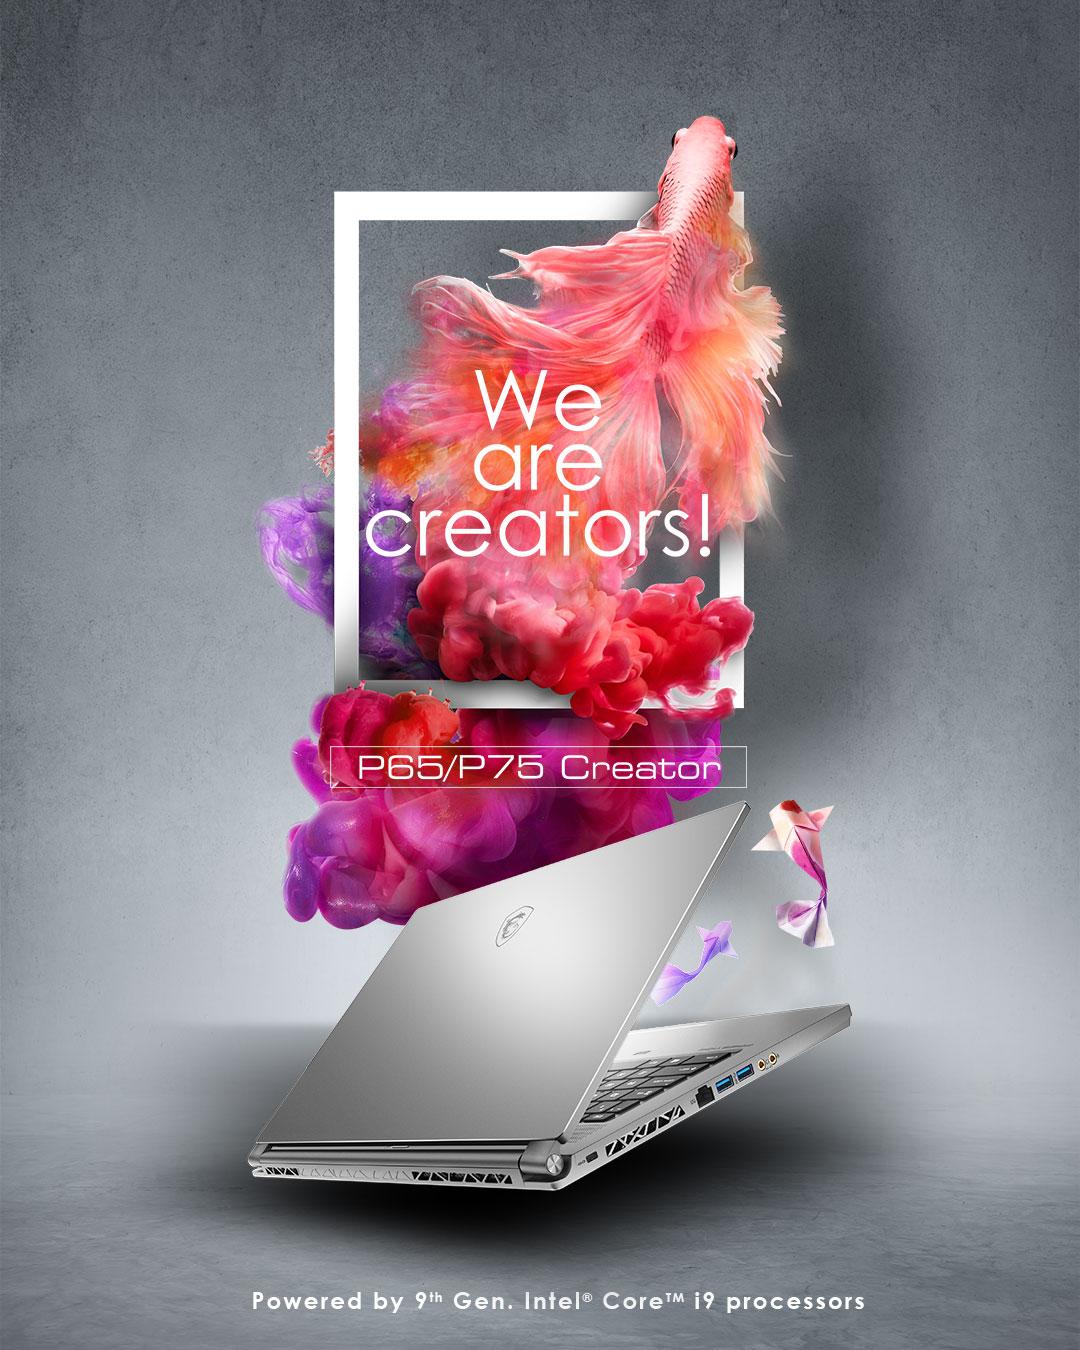 We are creators! P65 / P75 Creator